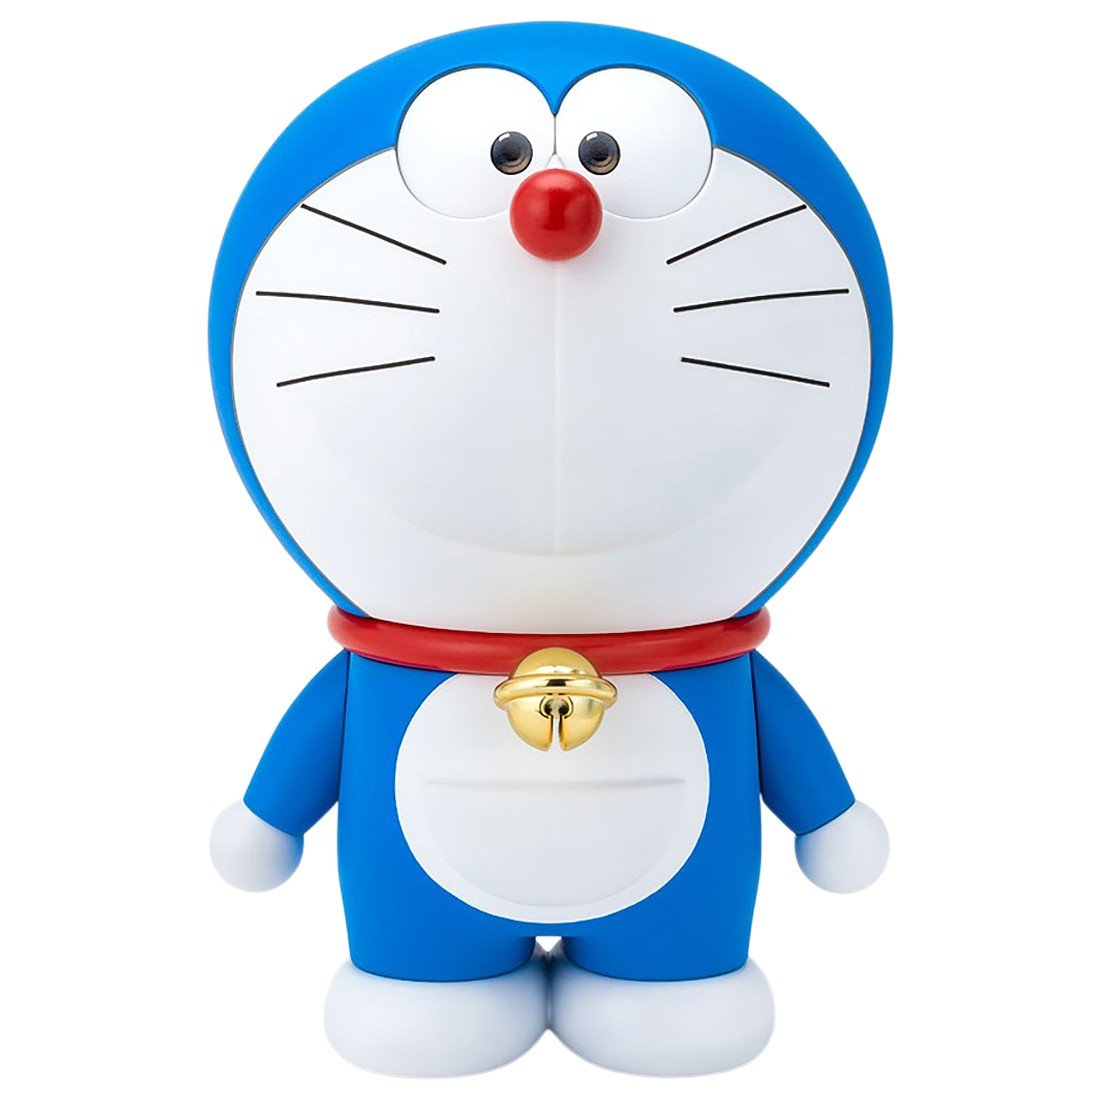 Bandai Figuarts Zero EX Stand By Me Doraemon 2 - Doraemon Figure (blue)